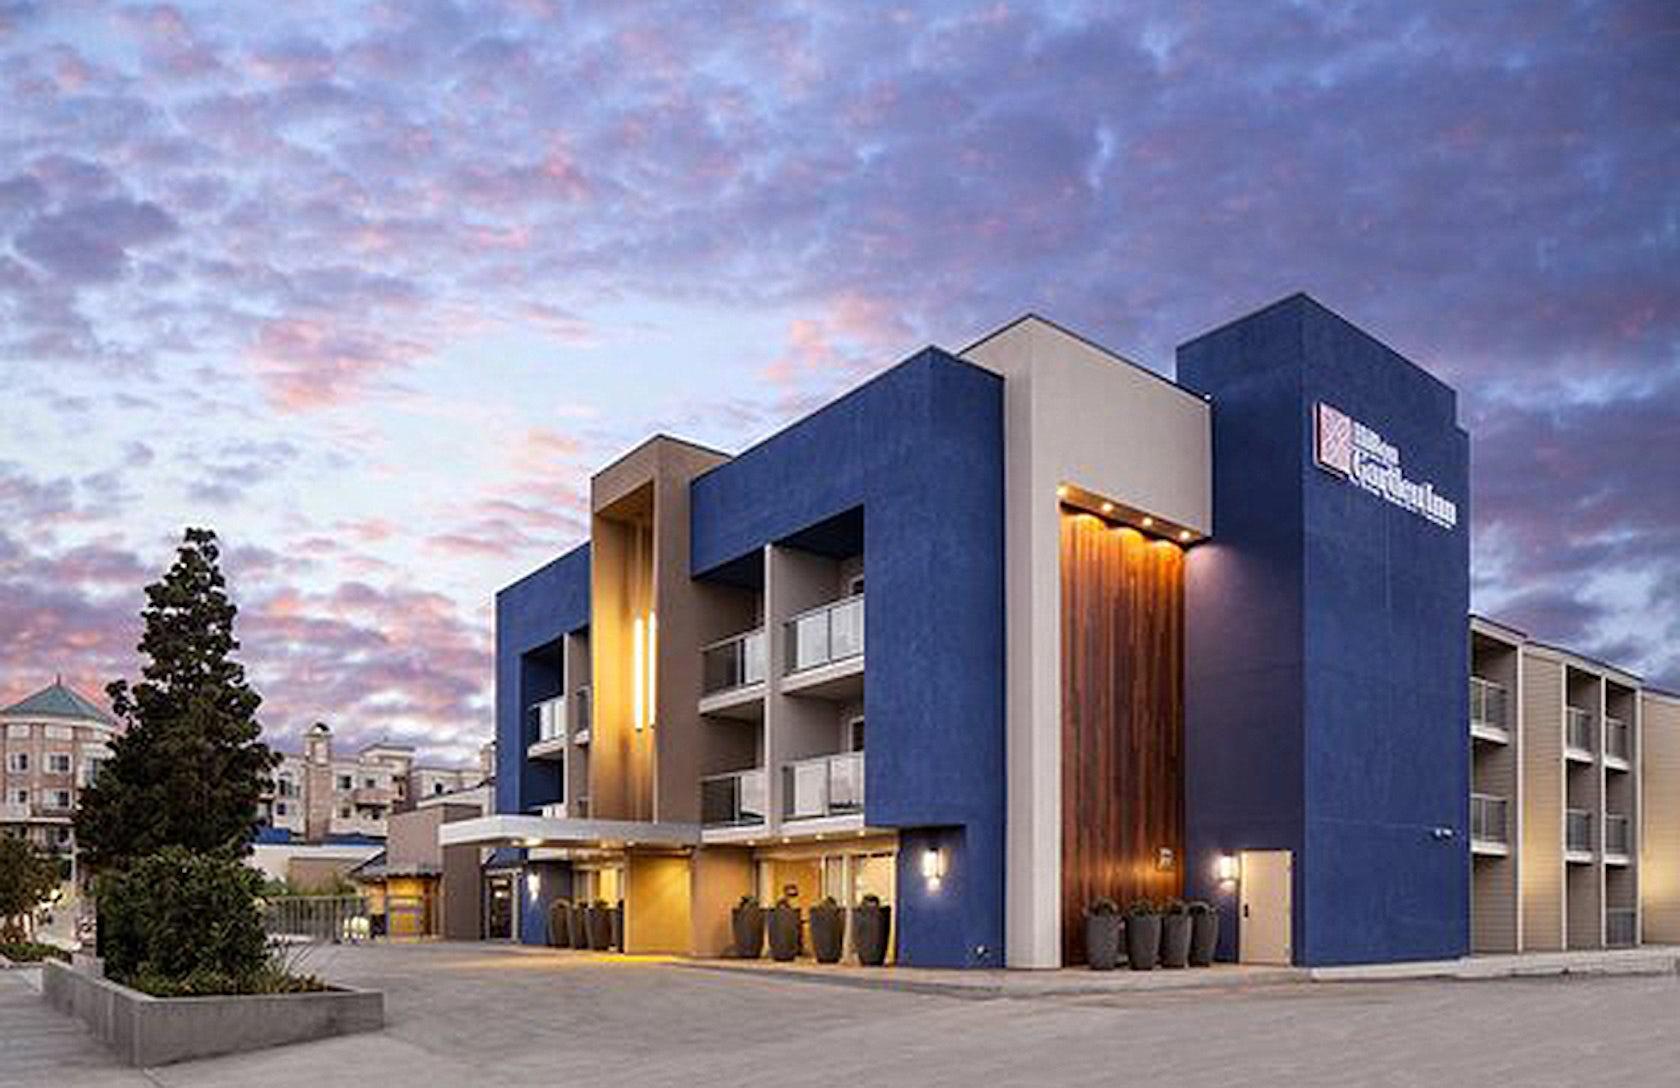 Hilton Garden Inn Marina Del Rey Architizer